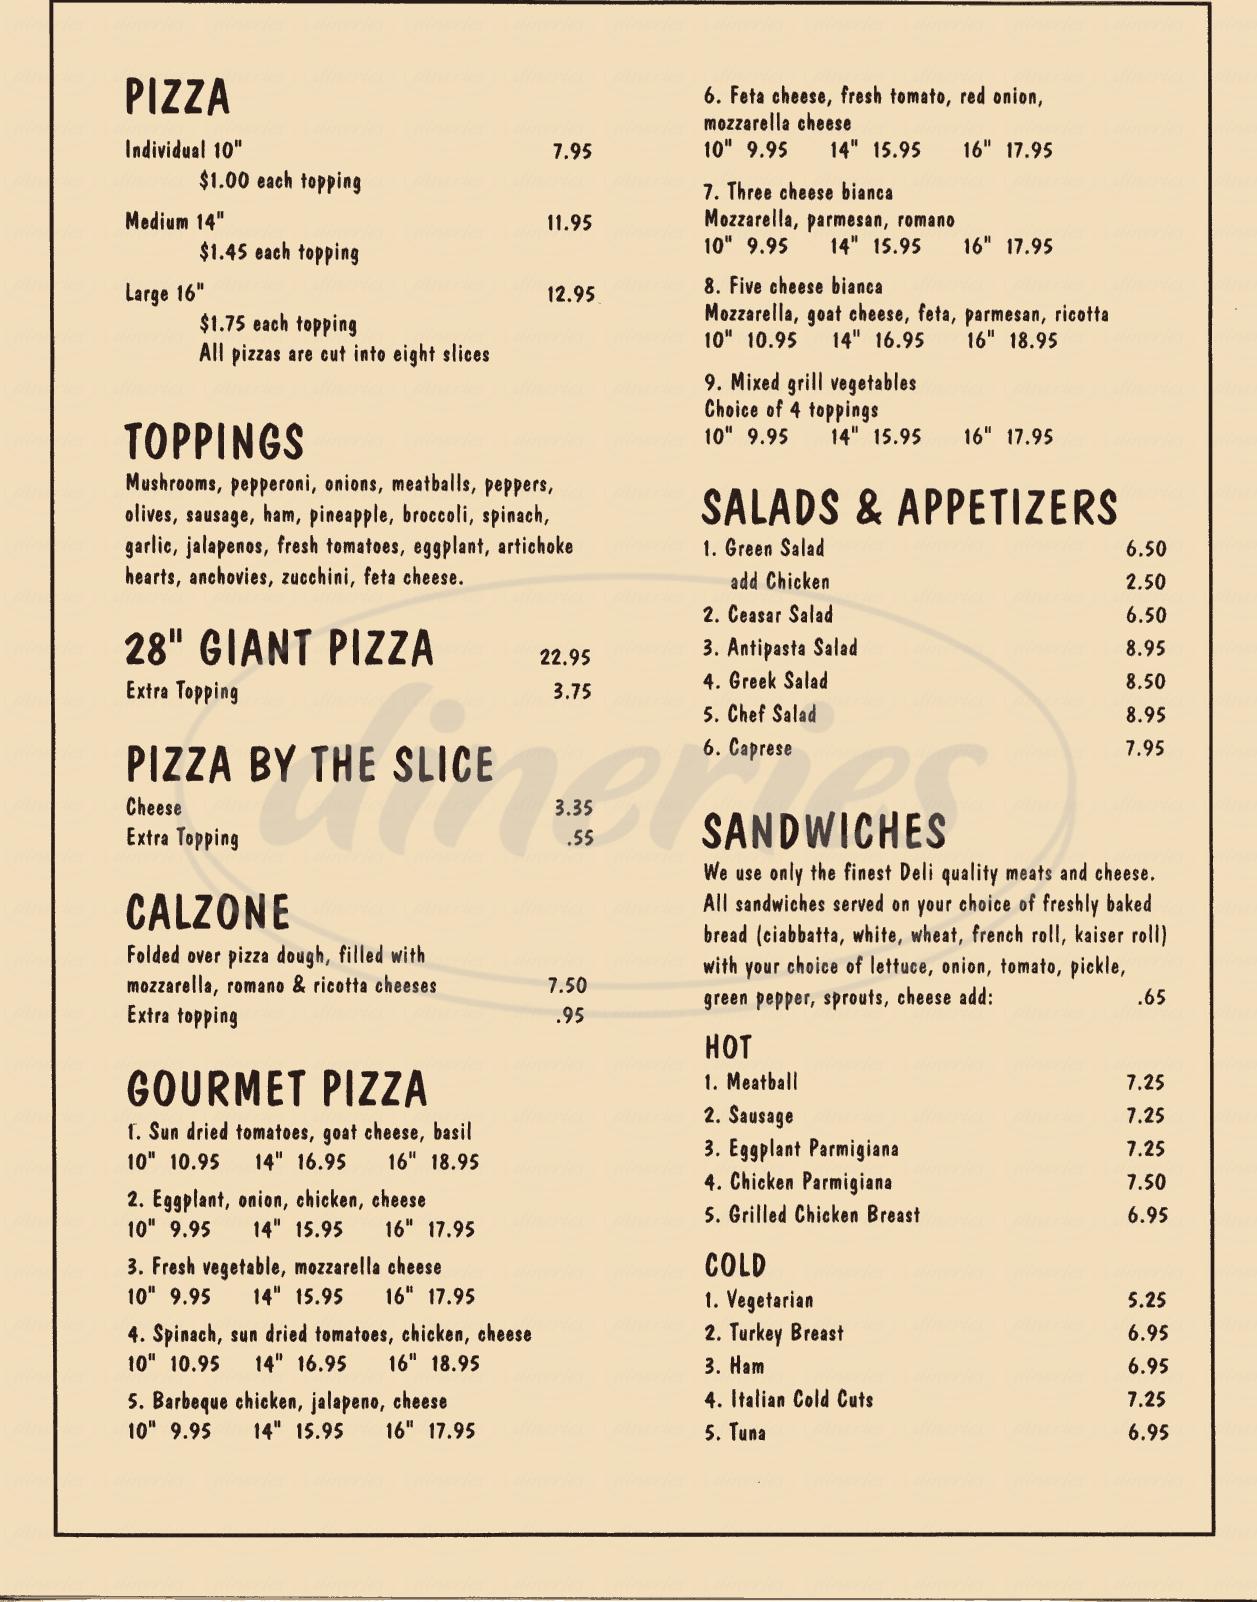 menu for Pagliacci's